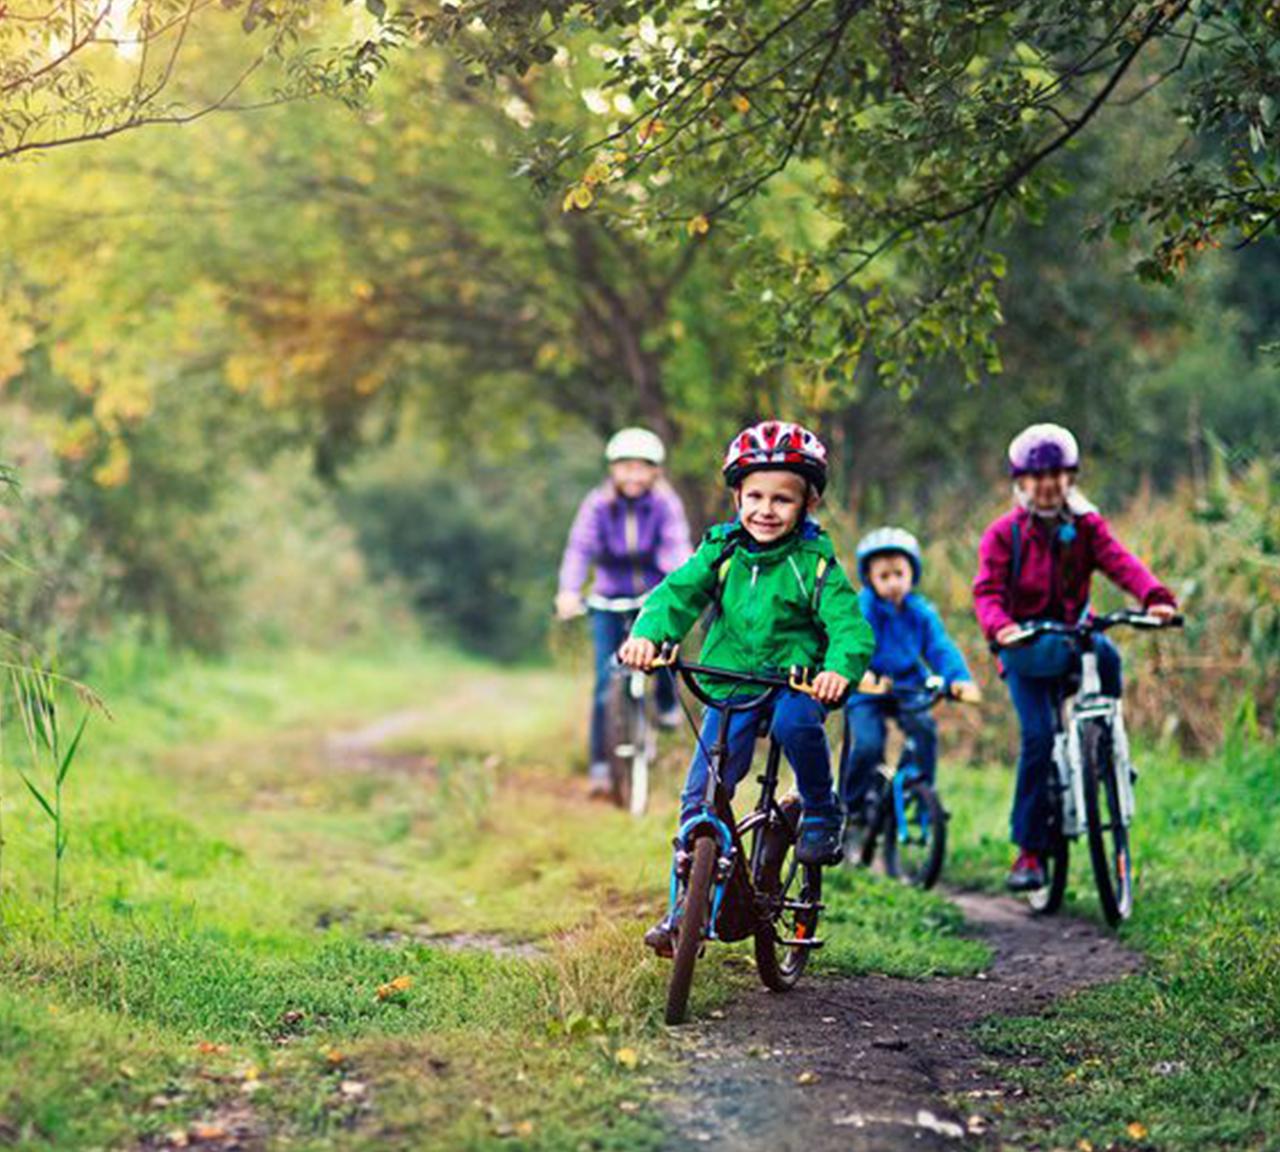 Family biking with helmets on